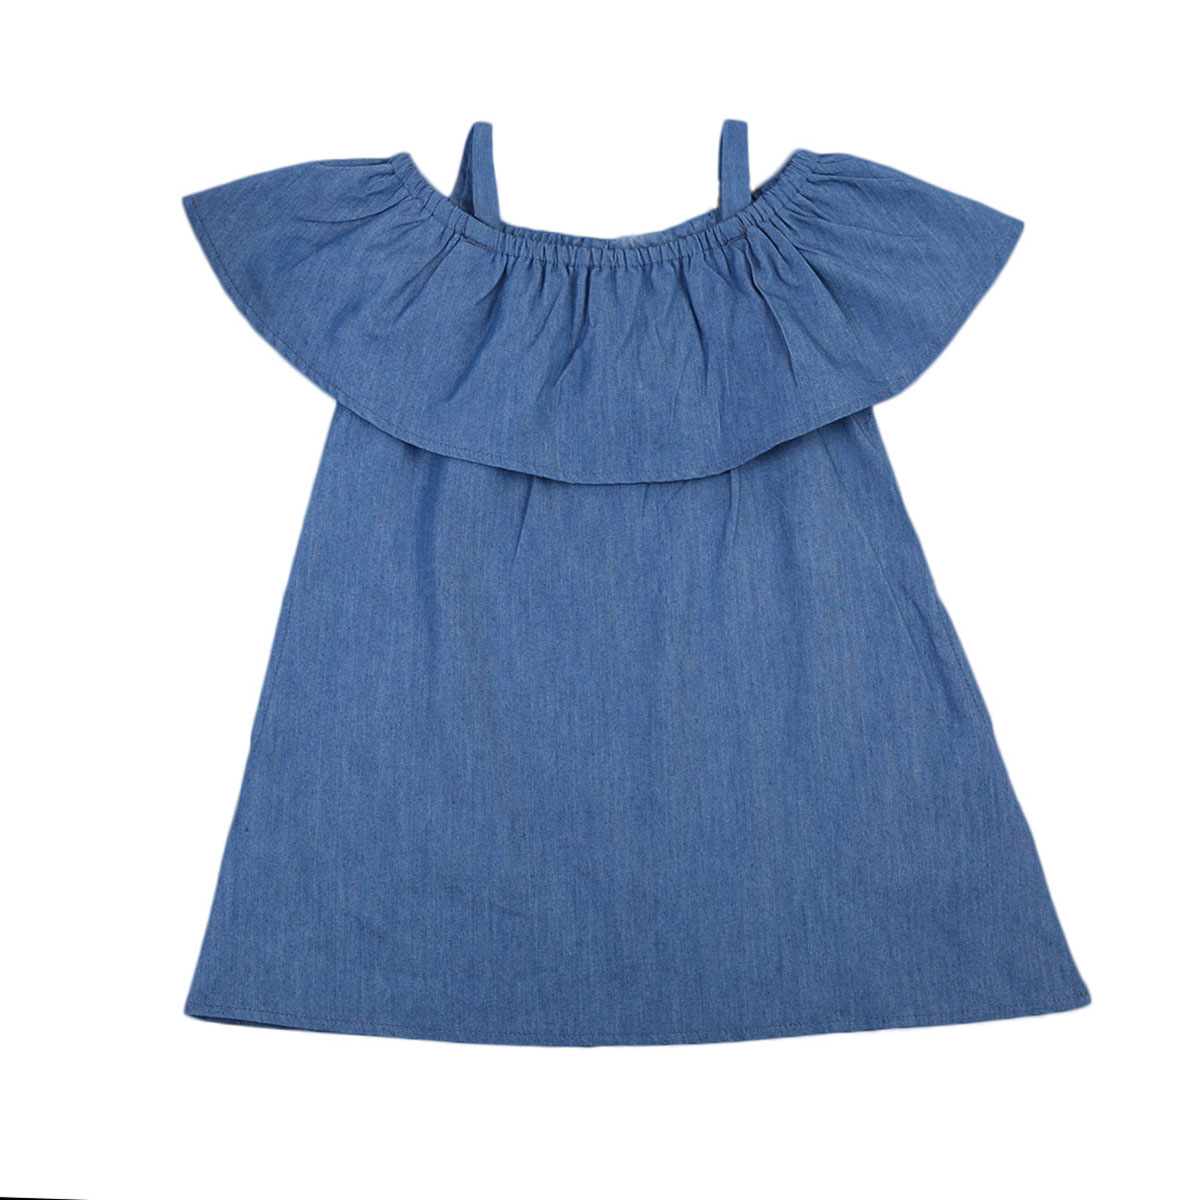 2017 Denim Dress Kids Baby Girl Dress Children Denim Girls Party Dresses Girls Clothes 0-4Y